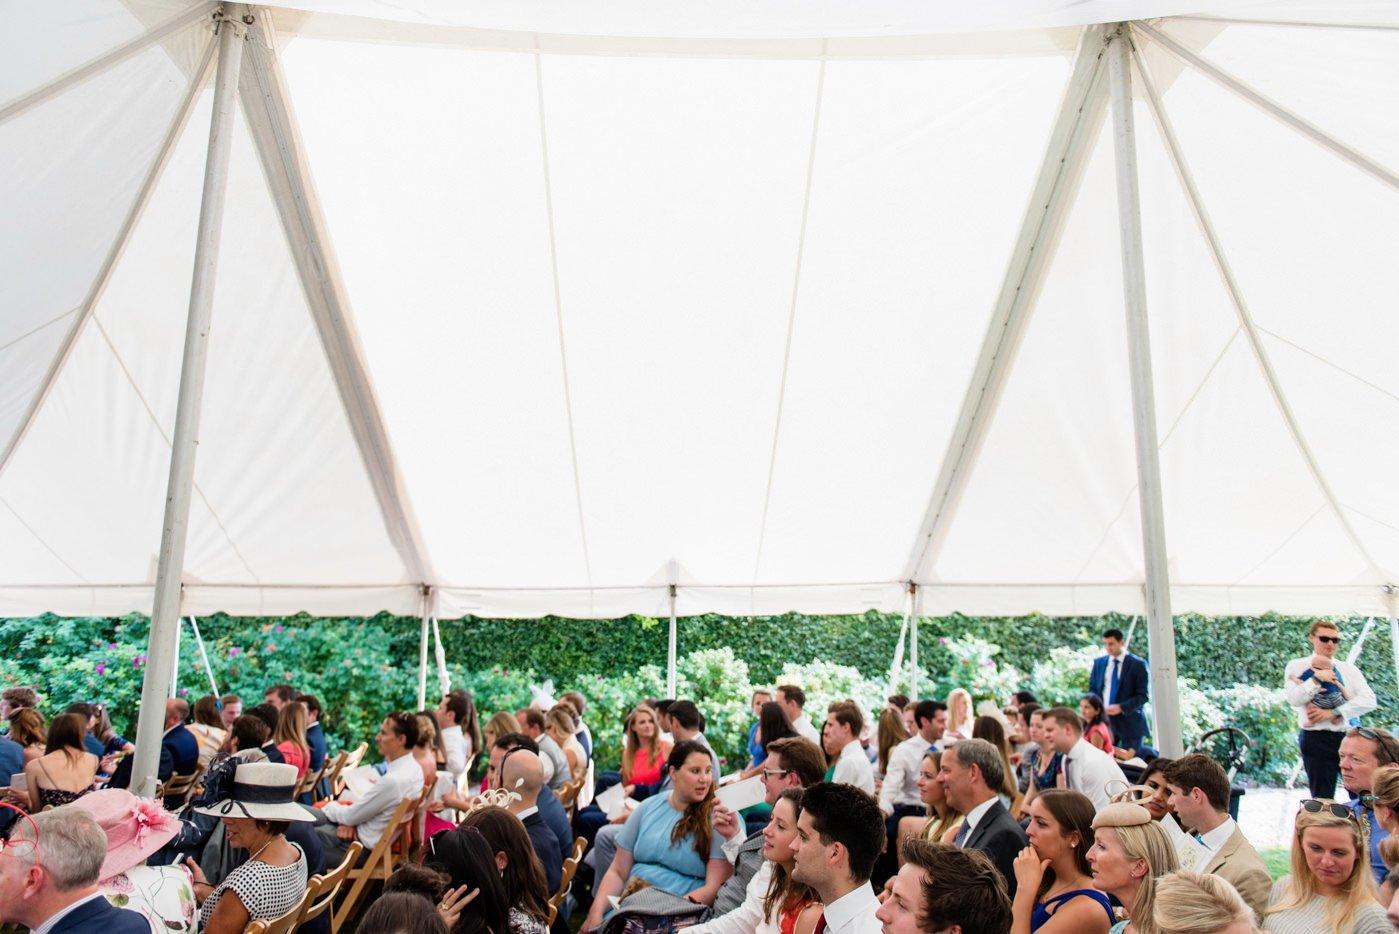 bignor-park-wedding-photography-robyn-and-tom-58